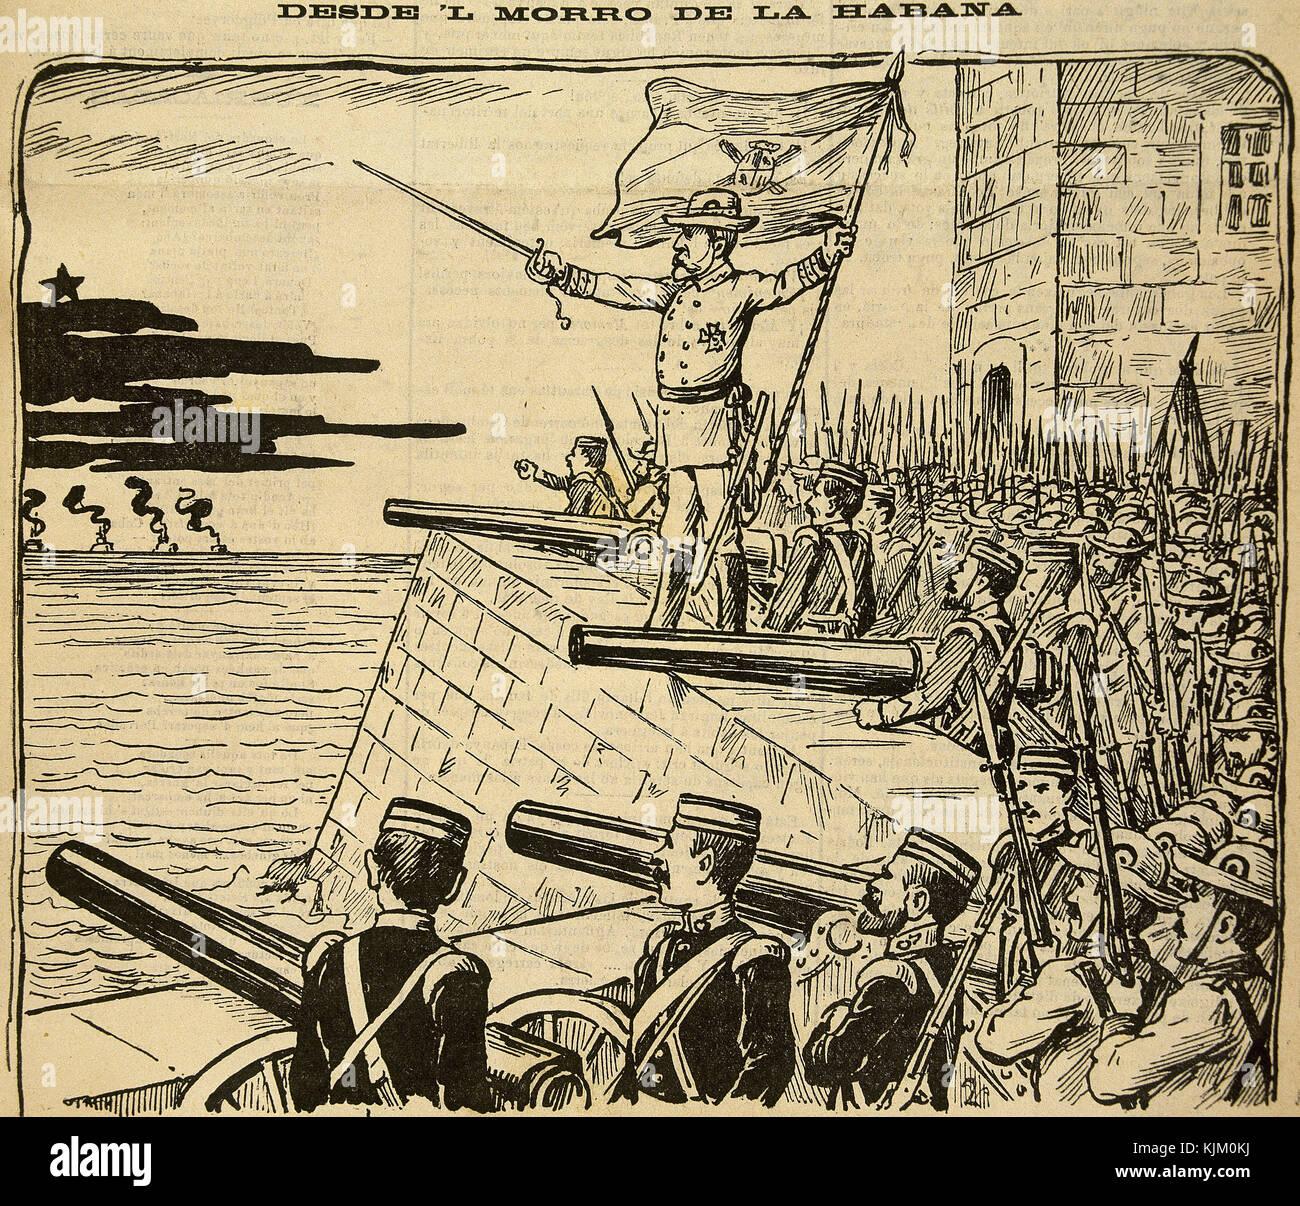 Independence War (1895-1898)